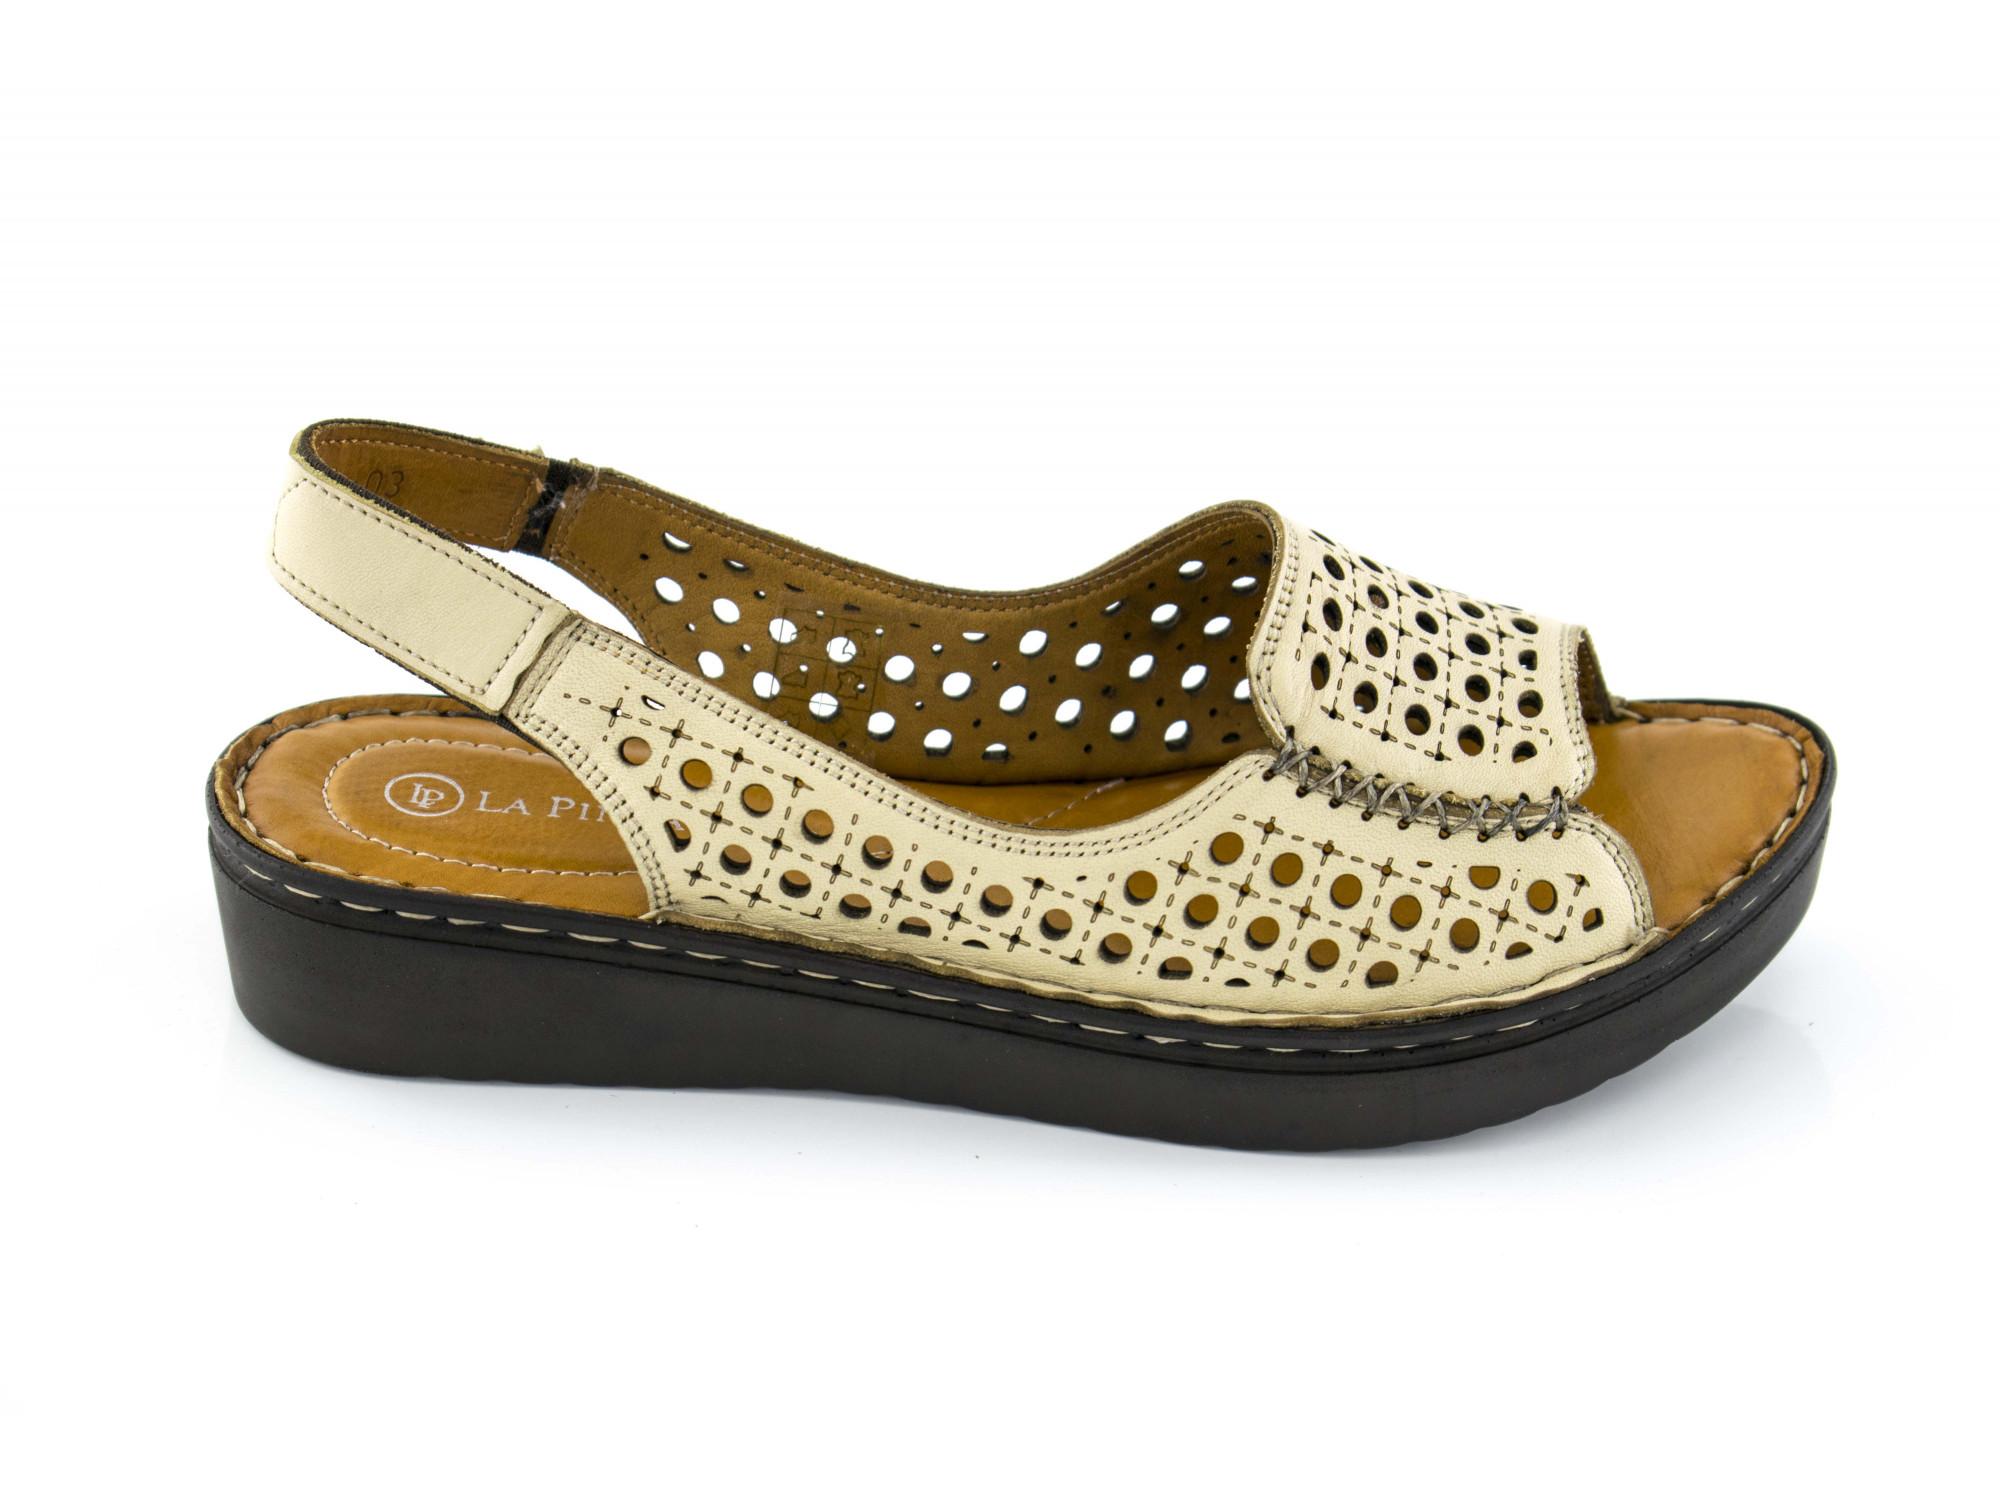 Женские ботинки челси Jarpex 3350 бежевые, натуральная кожа.